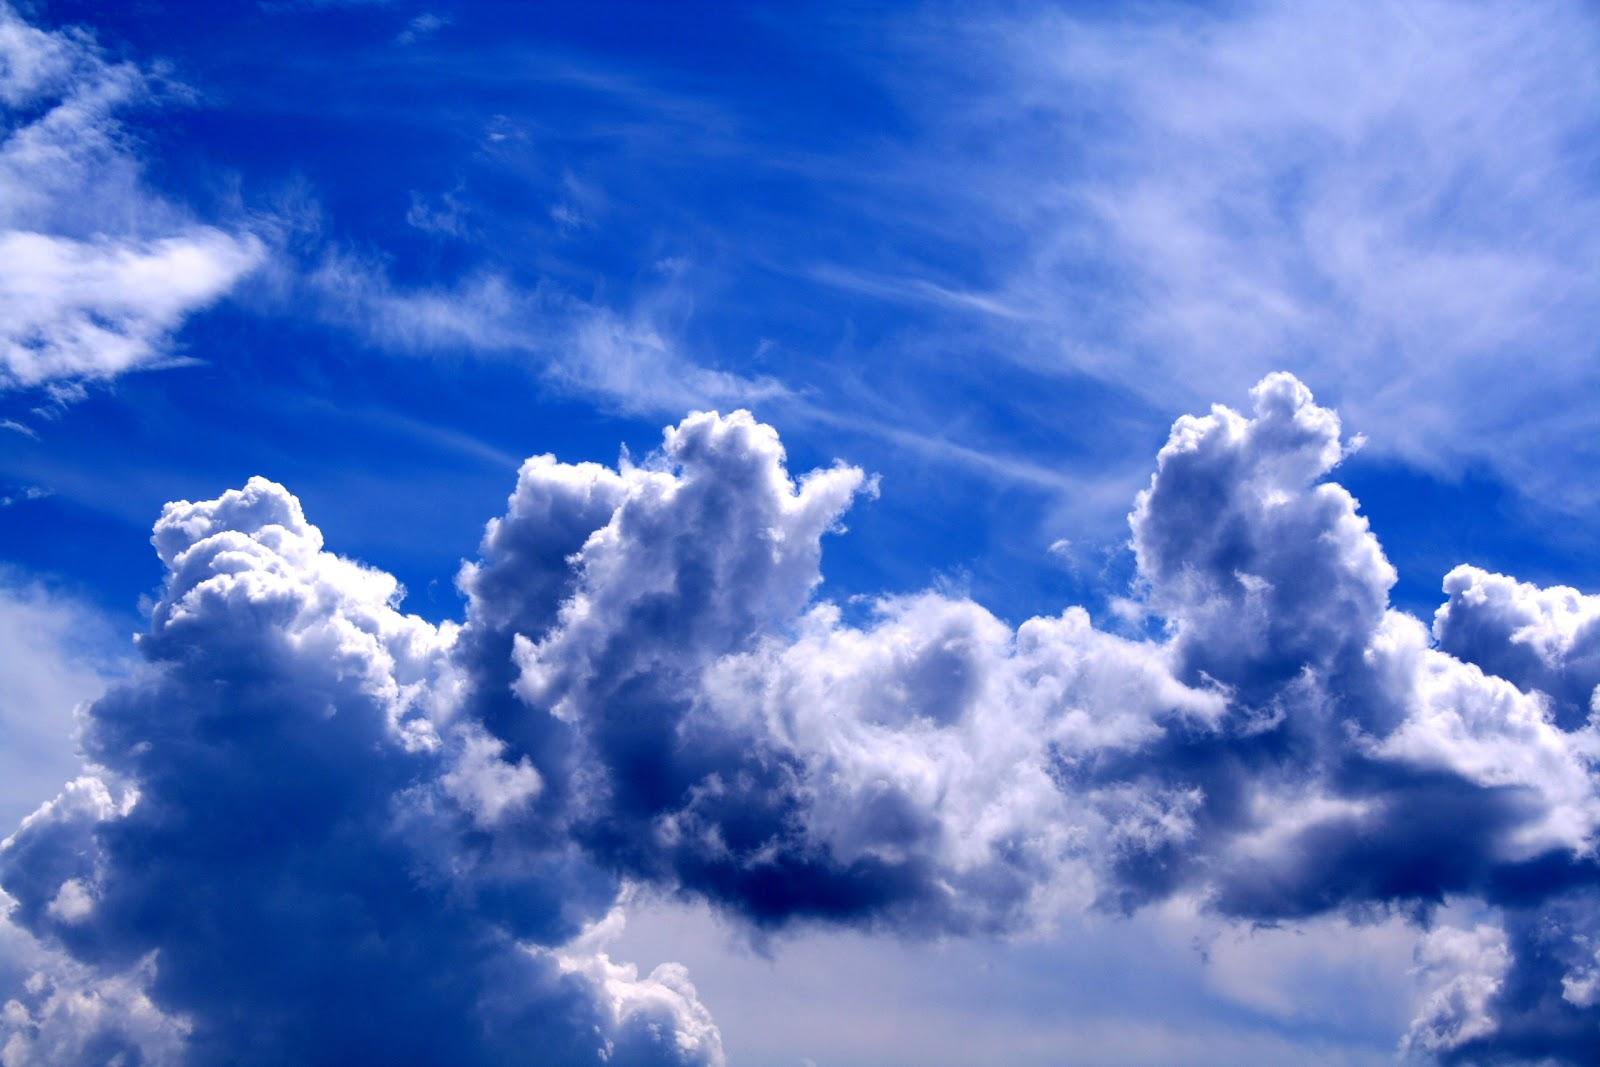 Fotos E Imagenes: Cielo Azul Con Nubes